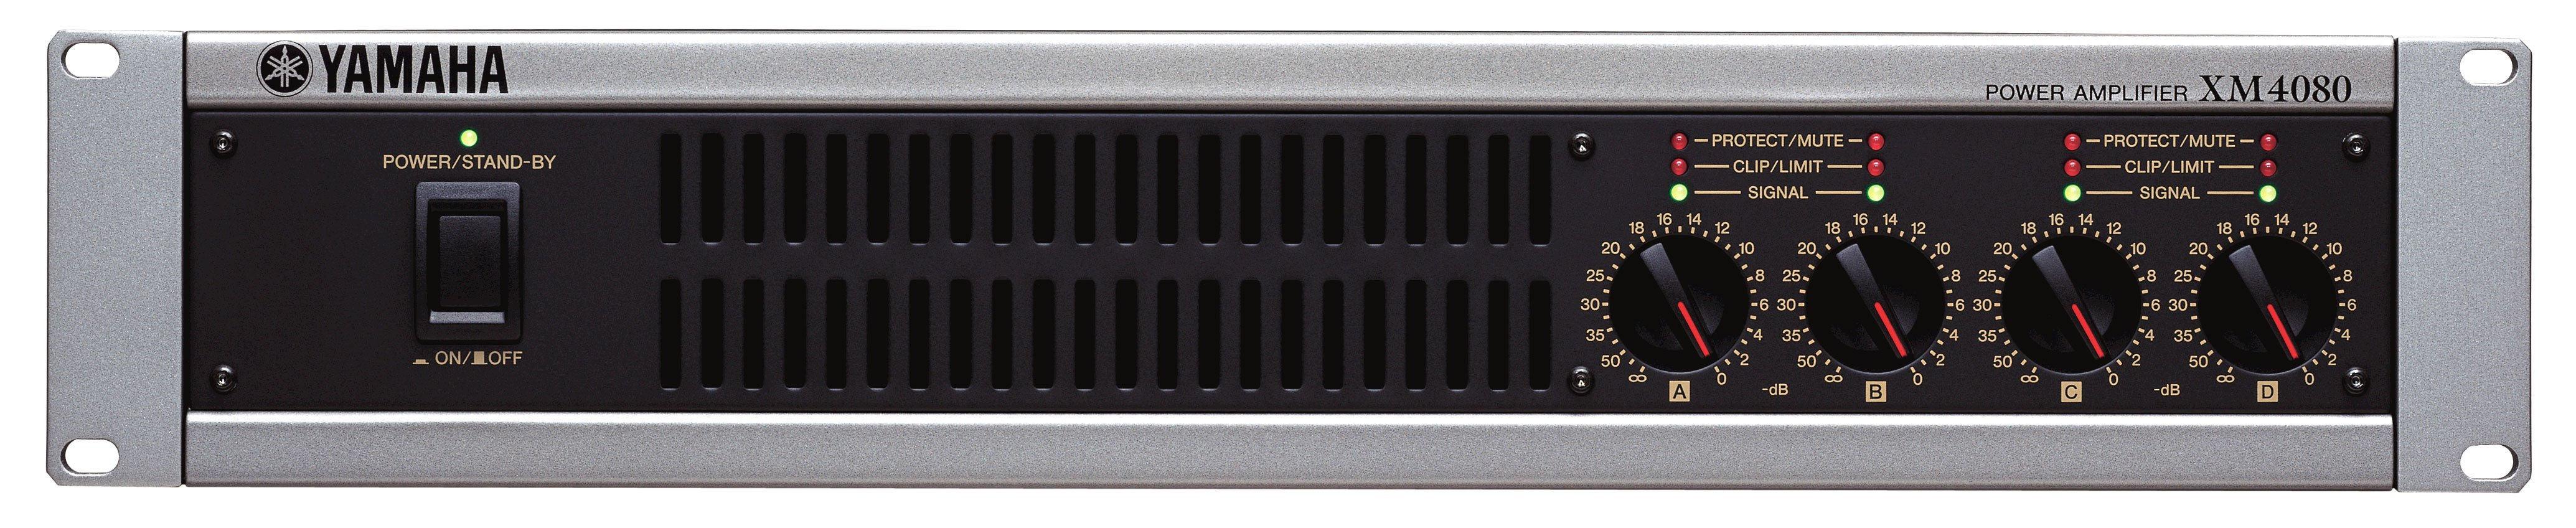 Amplifier 4-ch 115w 4-ohm 2u